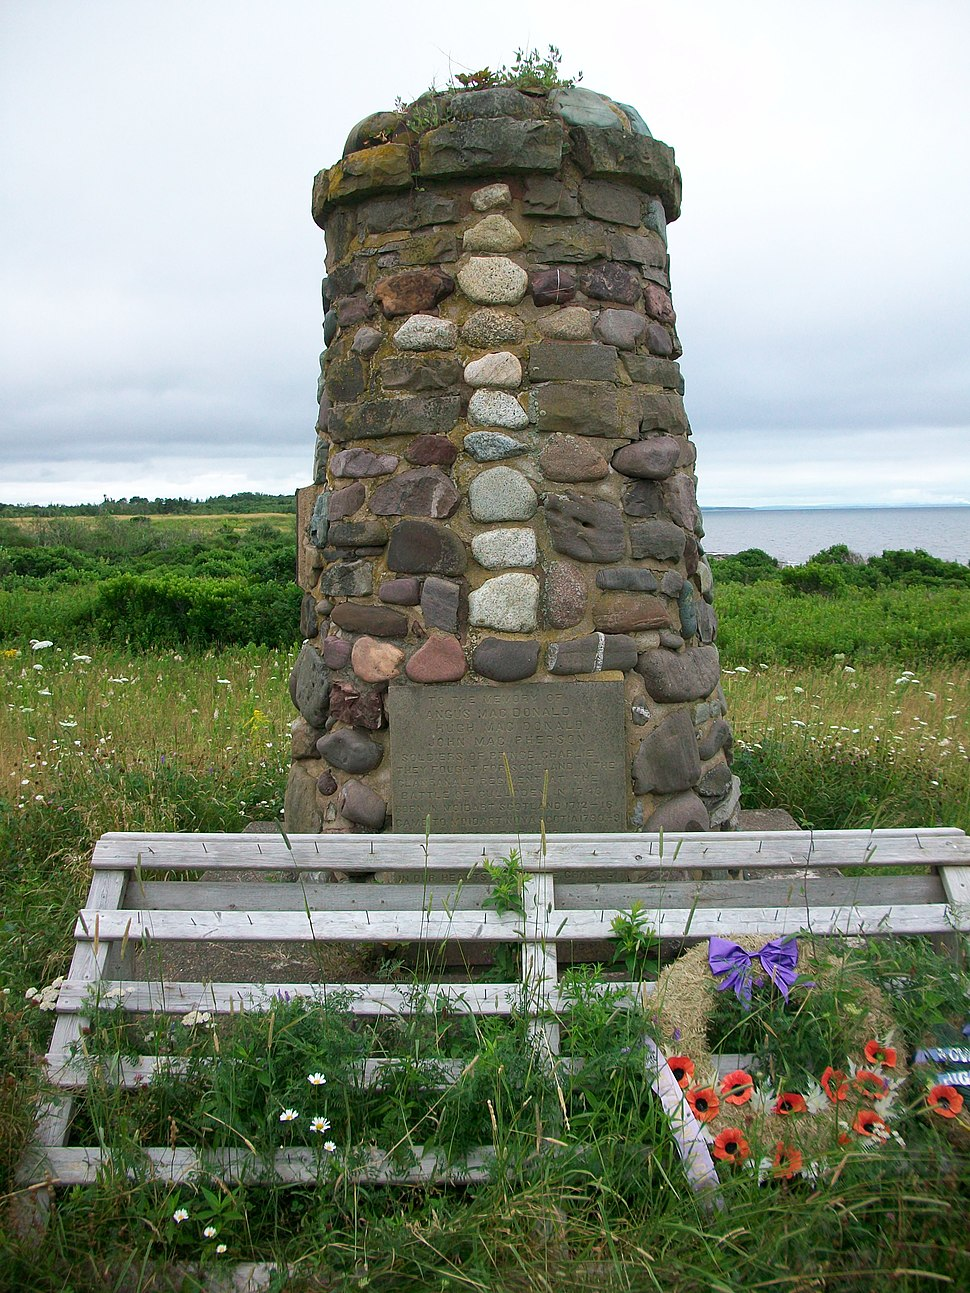 Culloden Cairn at Knoydart, Nova Scotia